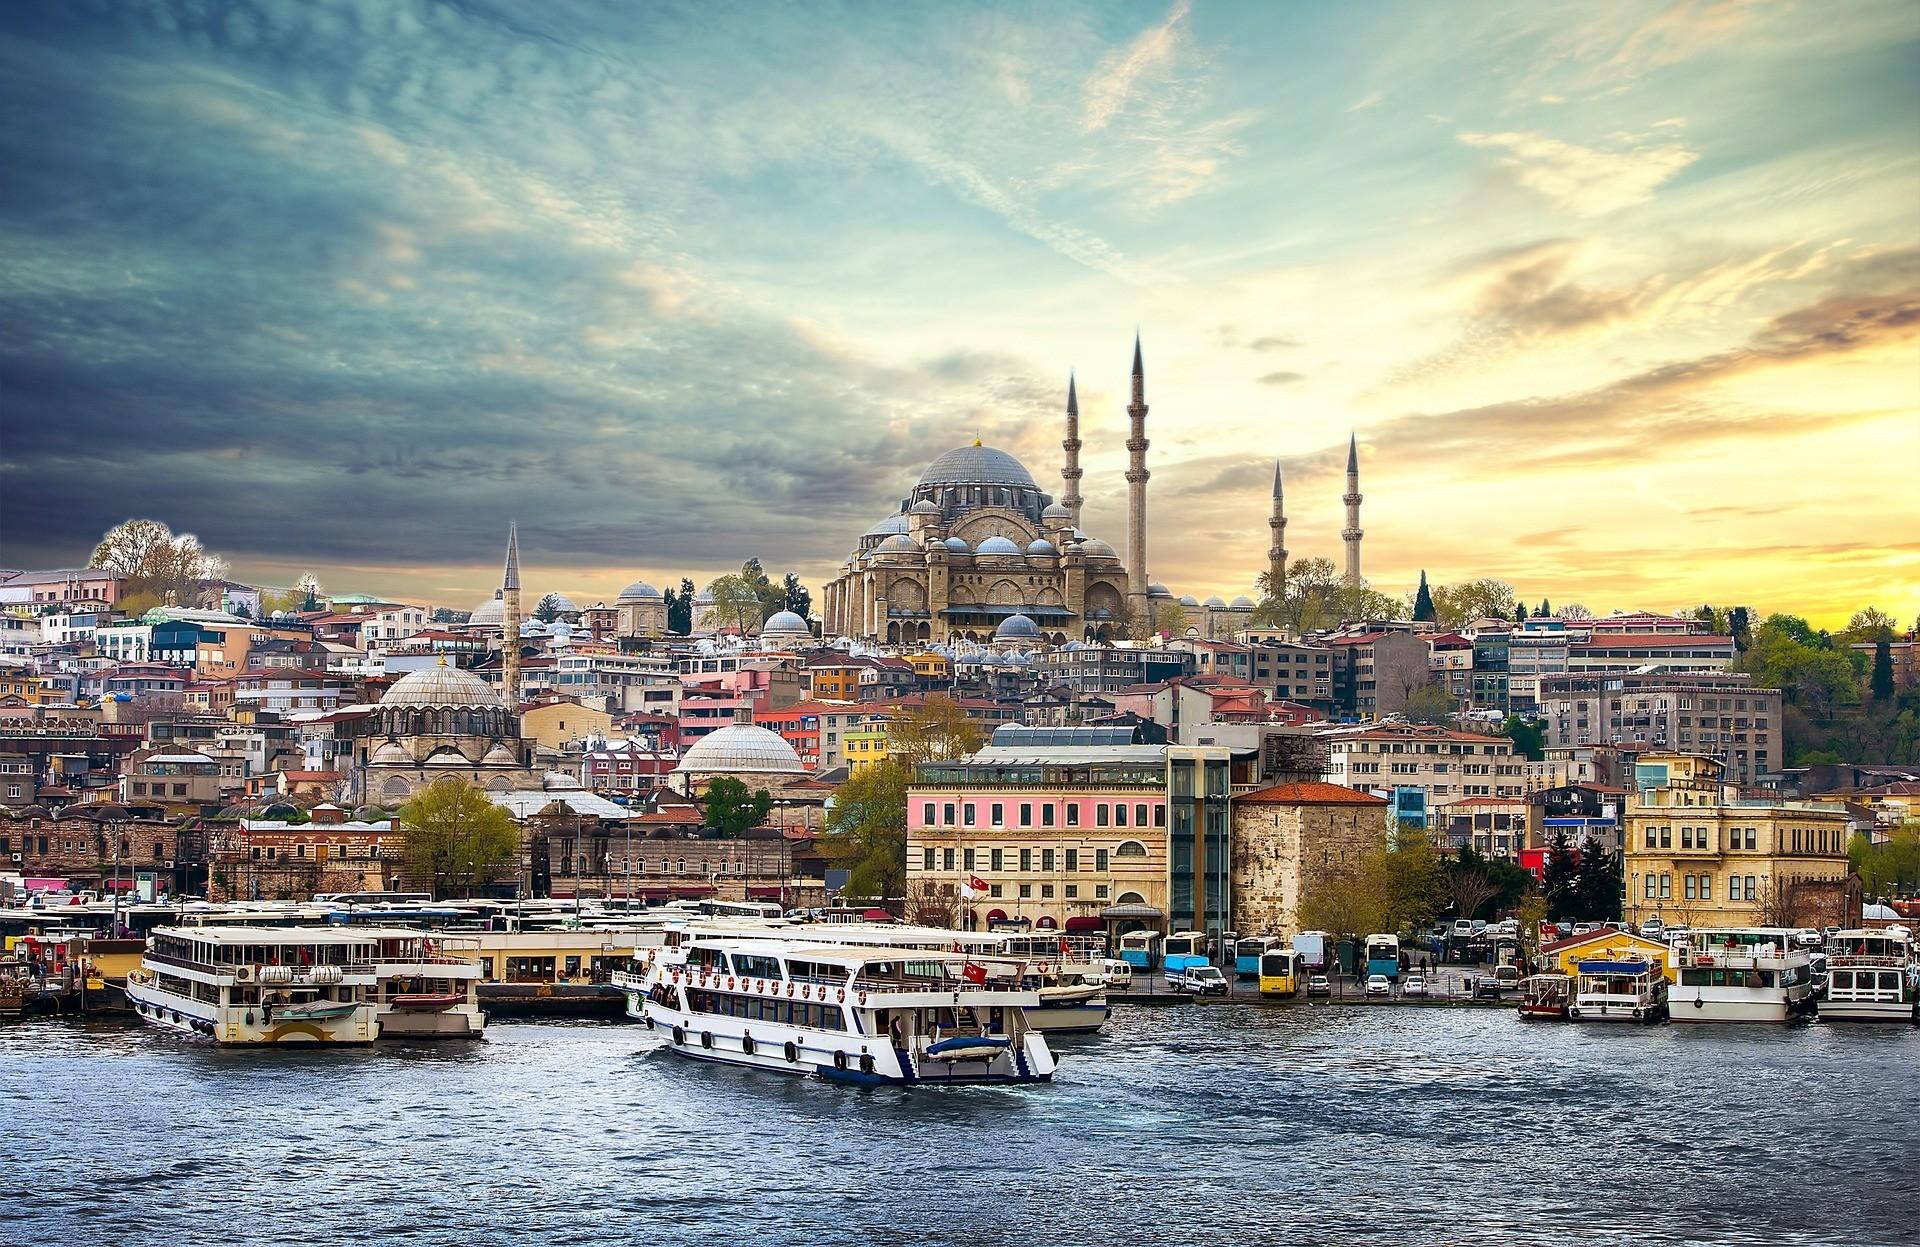 turkey earthquake reconstruction - 31